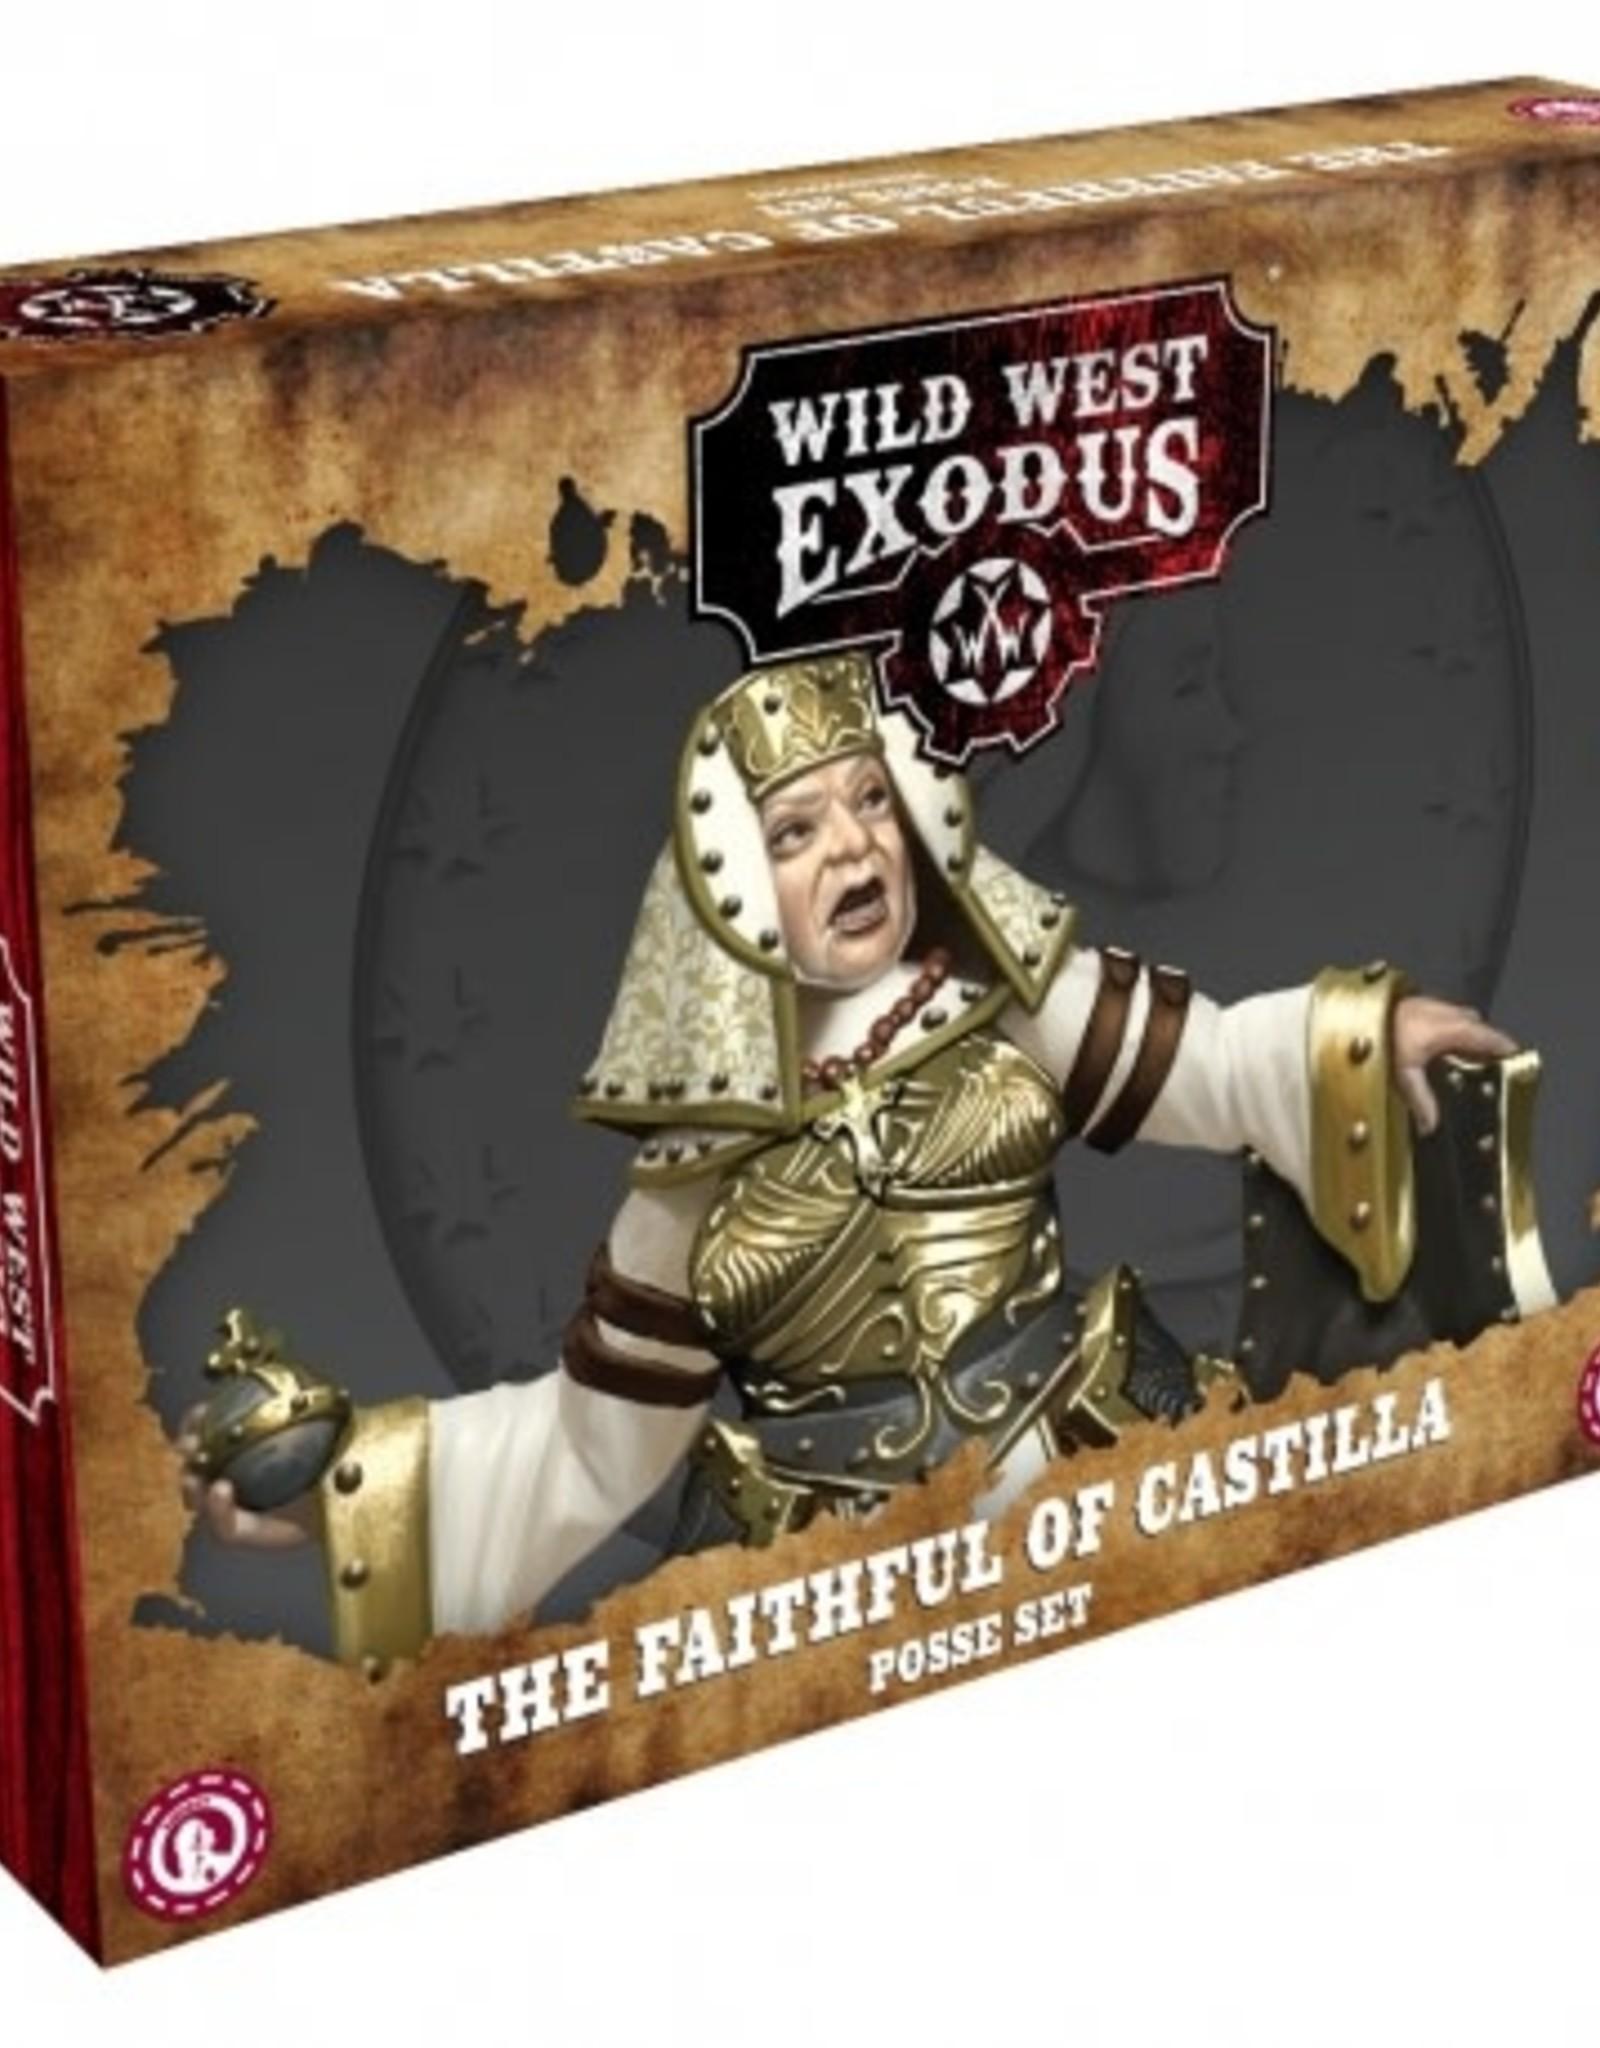 Warcradle The Faithful of Castilla Posse Box